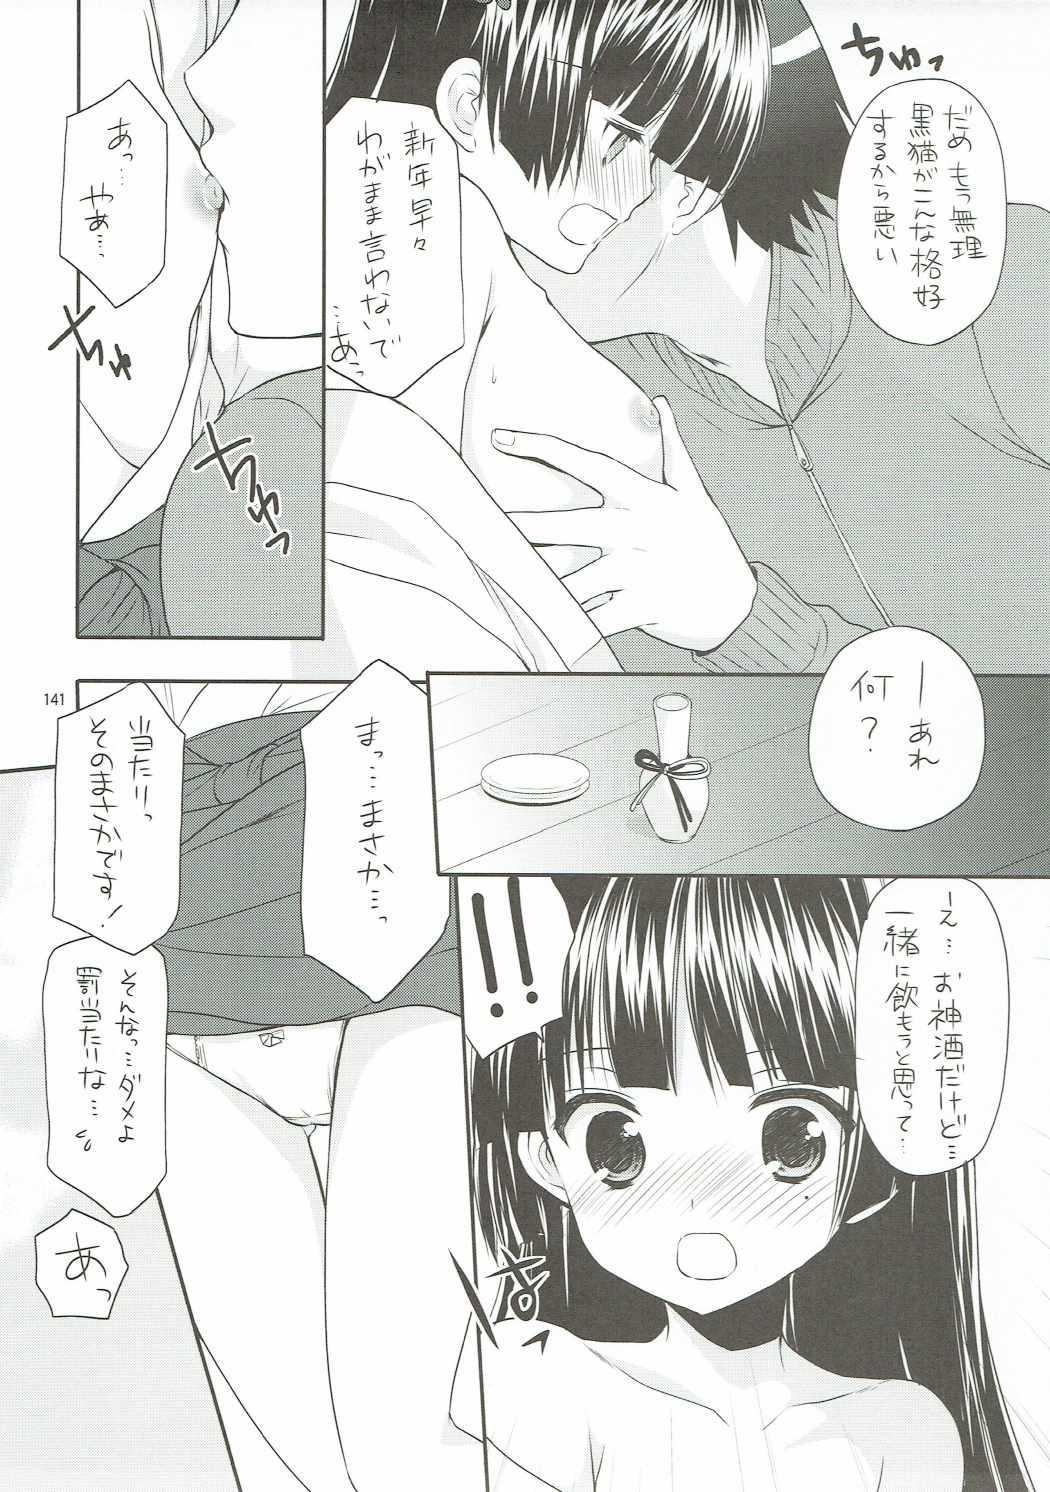 ANIME COLLECTION Imomuya Honpo - Singleton Anime Soushuuhen 139